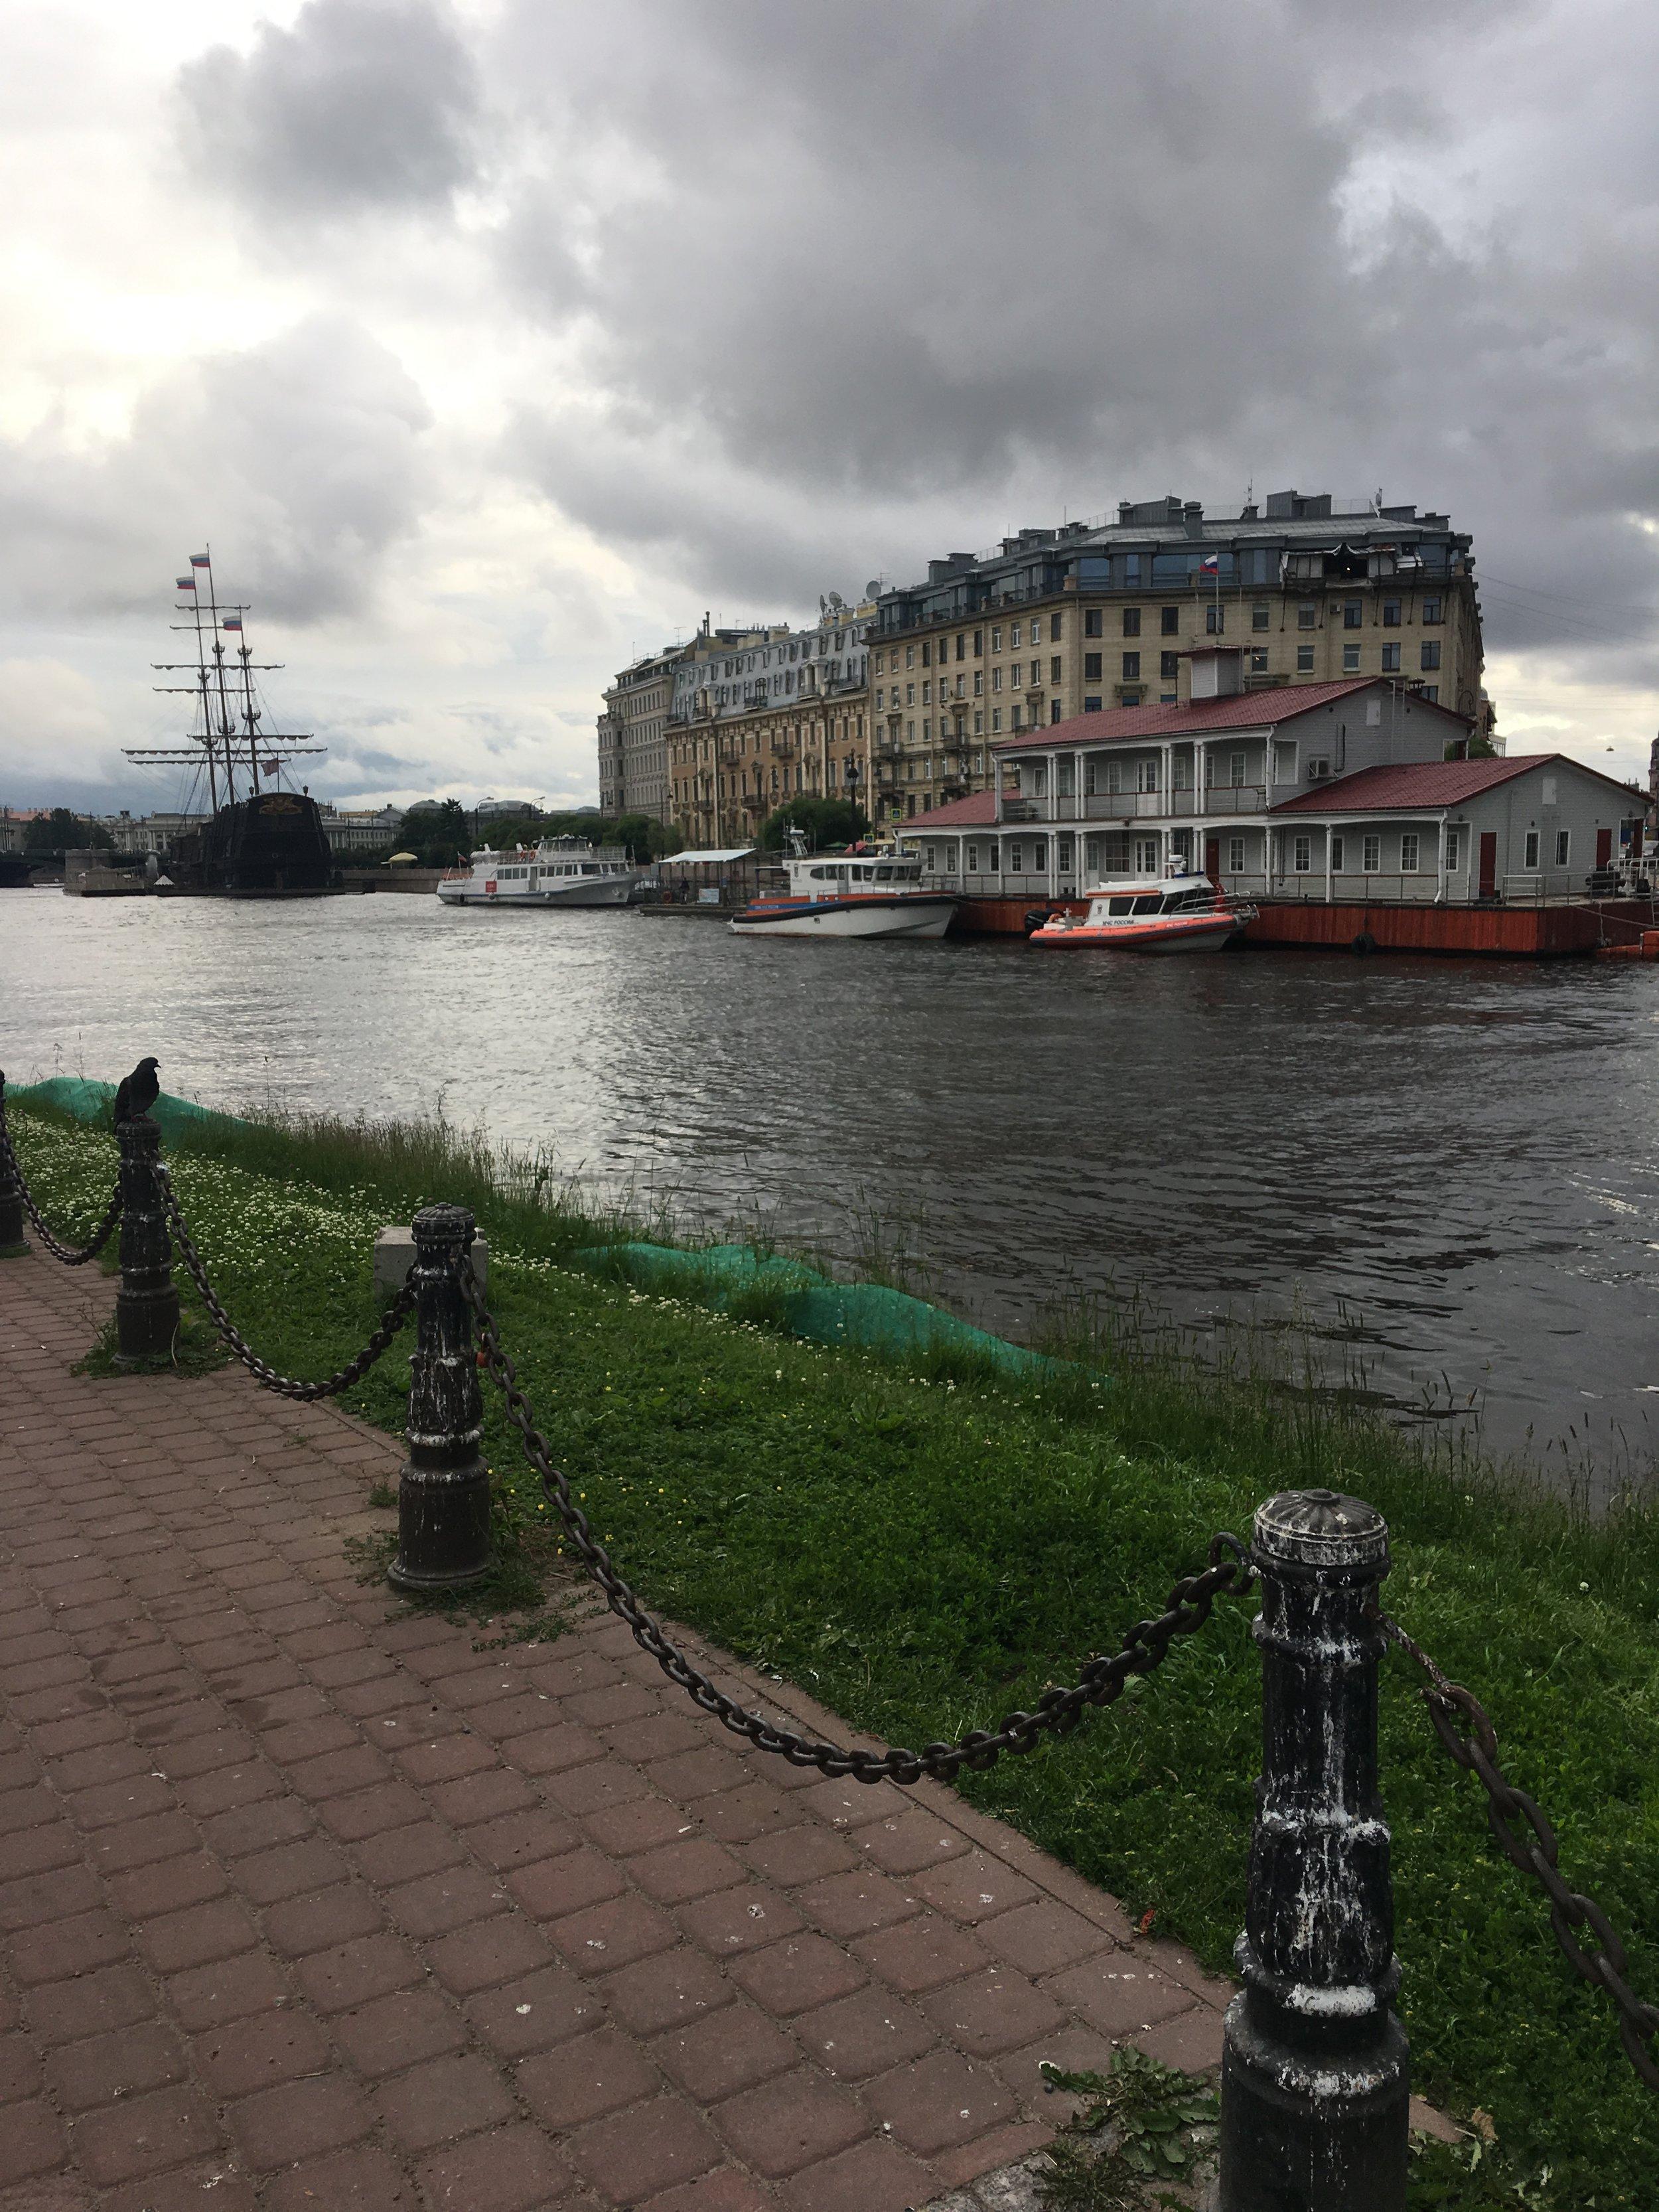 The Neva River